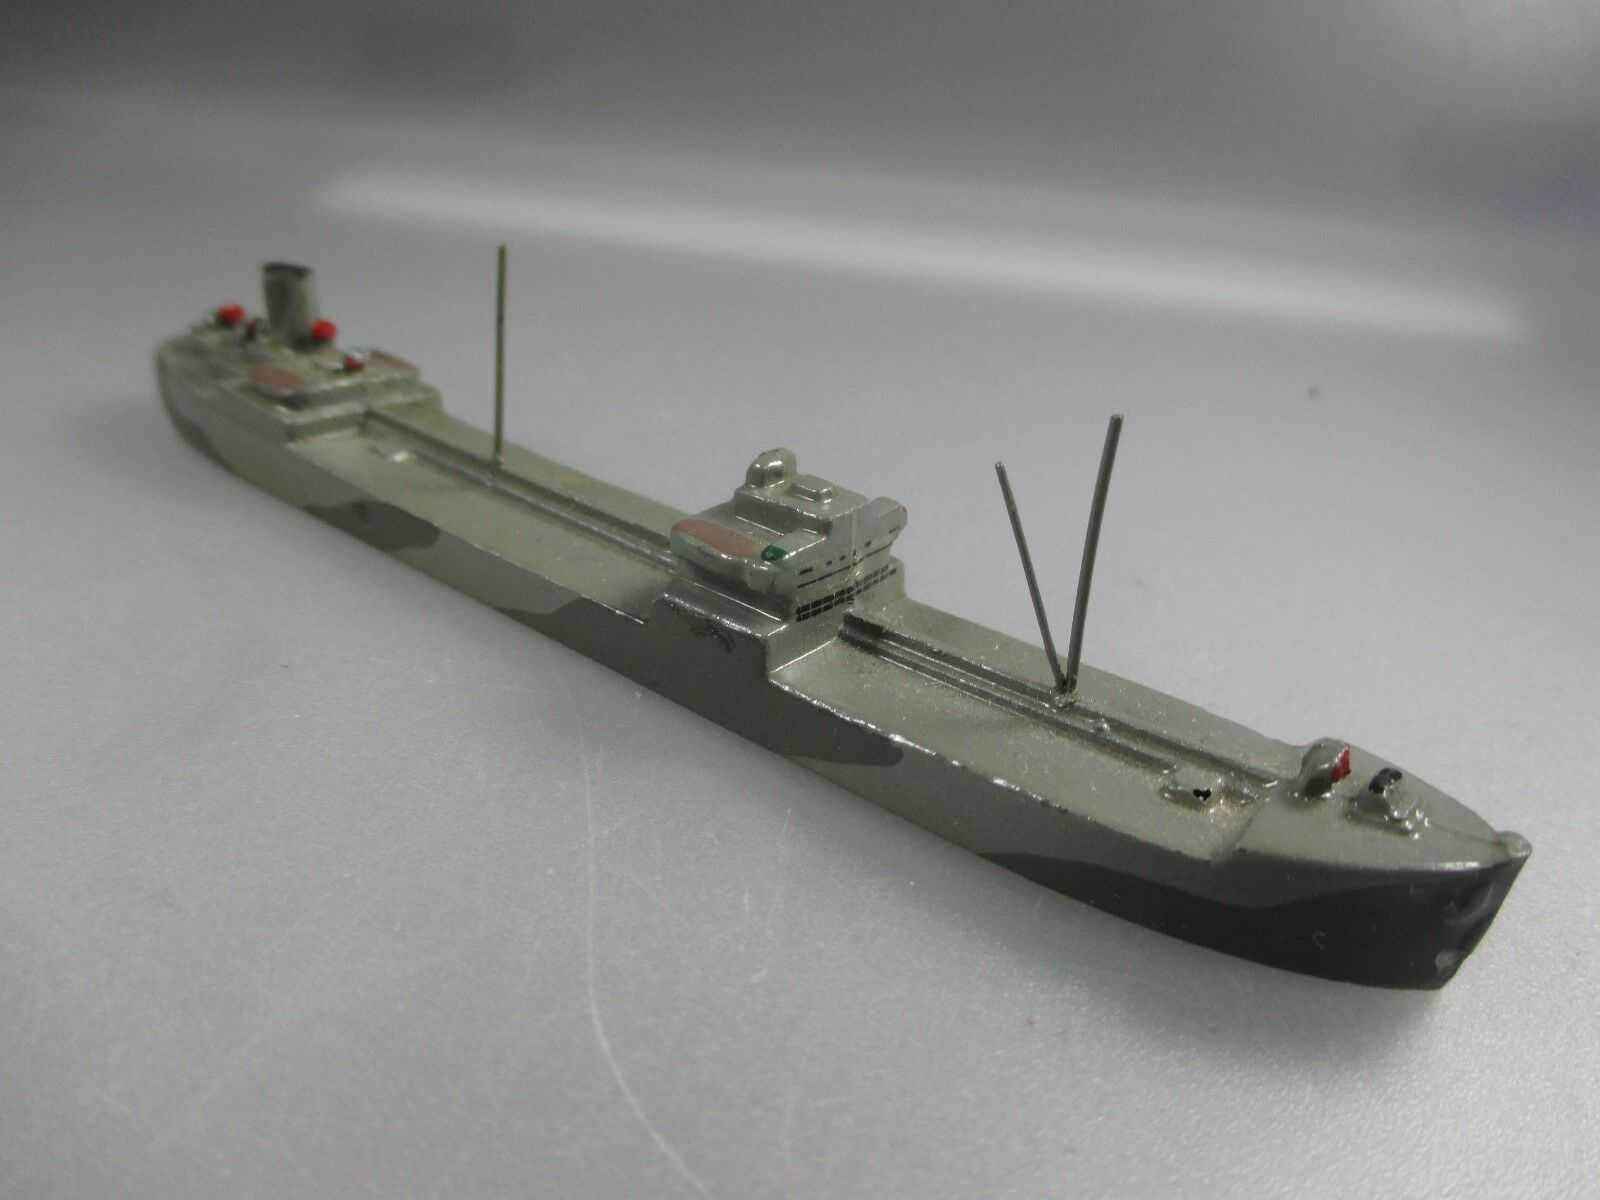 Wiking   Modèle  de Bateau   Franz Klasen   Leichtlegiecourirg Camouflage Wolkig  meilleurs prix